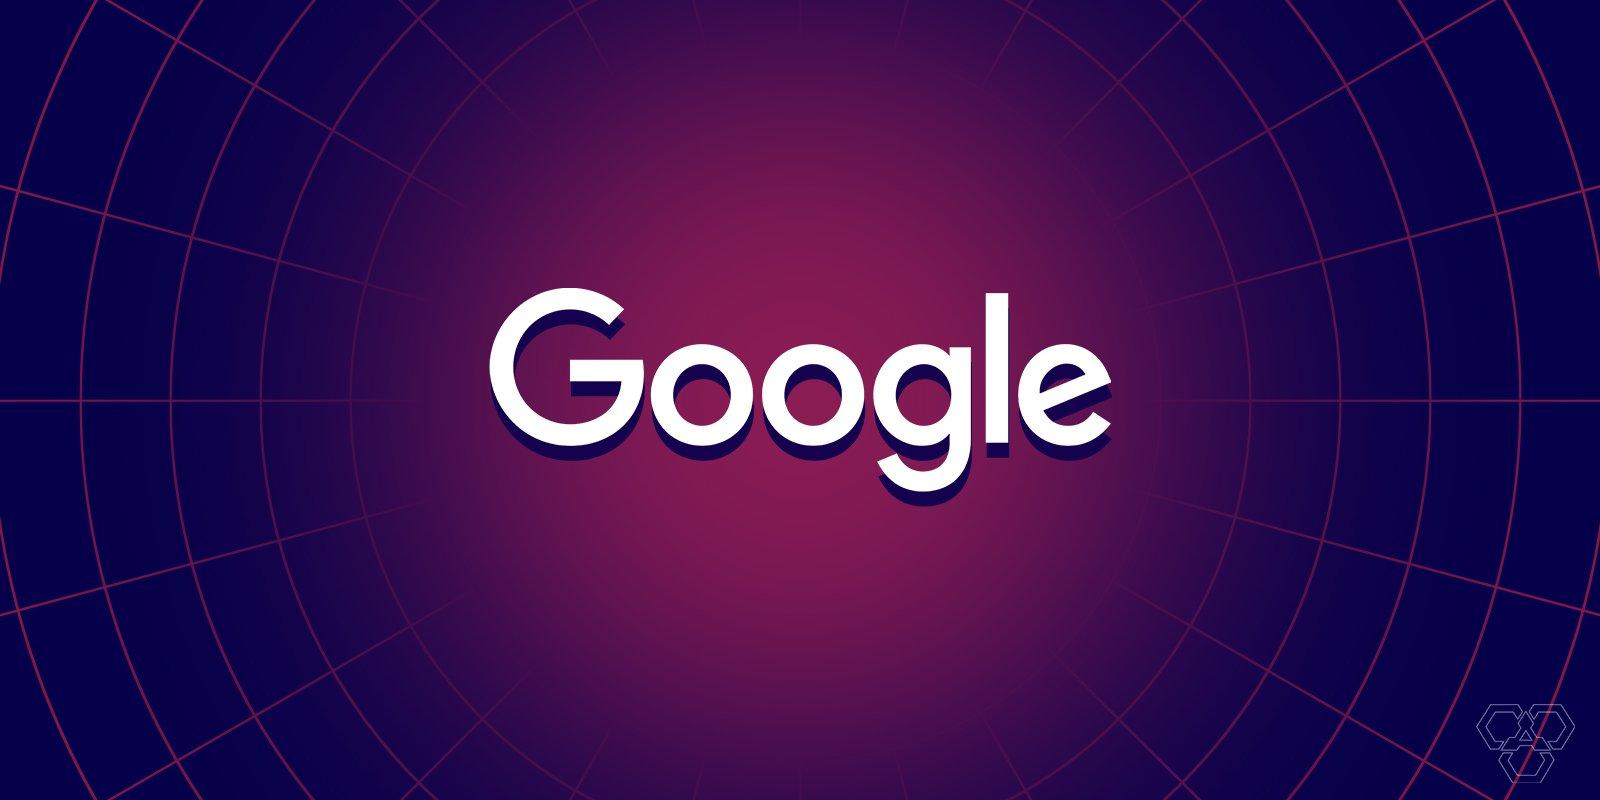 Google extends mandatory office return until January 2022